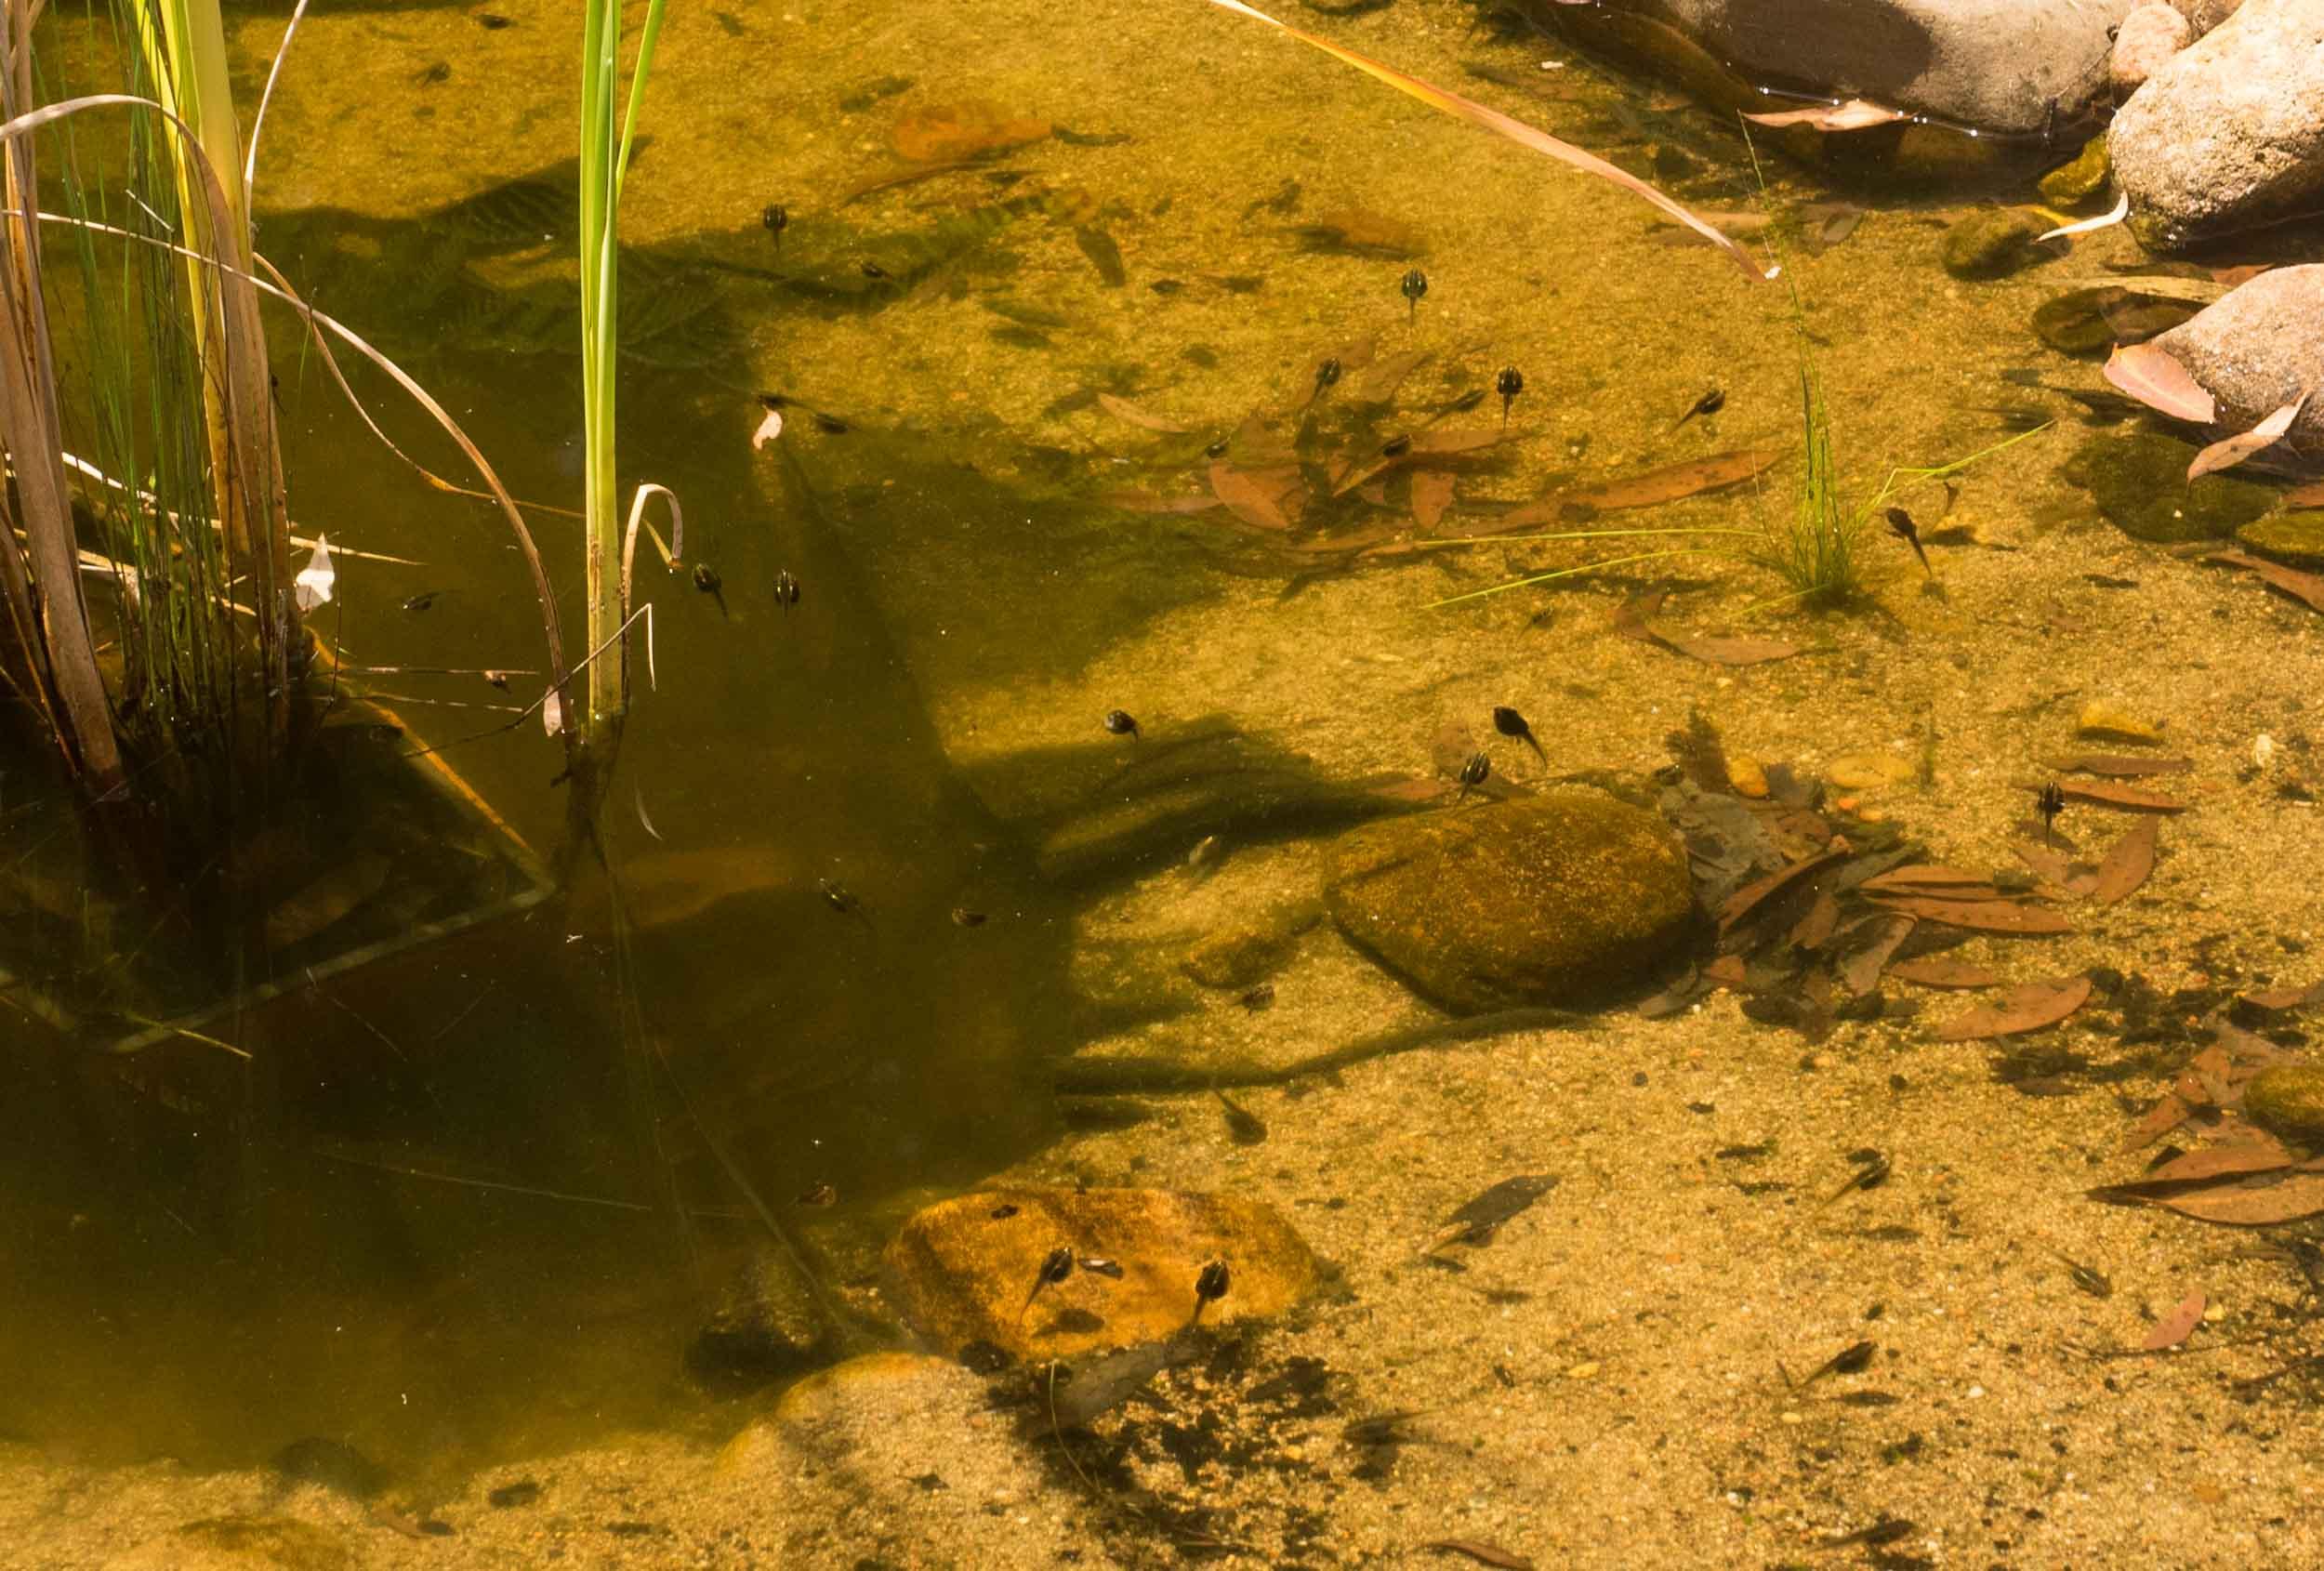 Hundreds of large Emerald-spotted Tree Frog tadpoles inhabit the pond